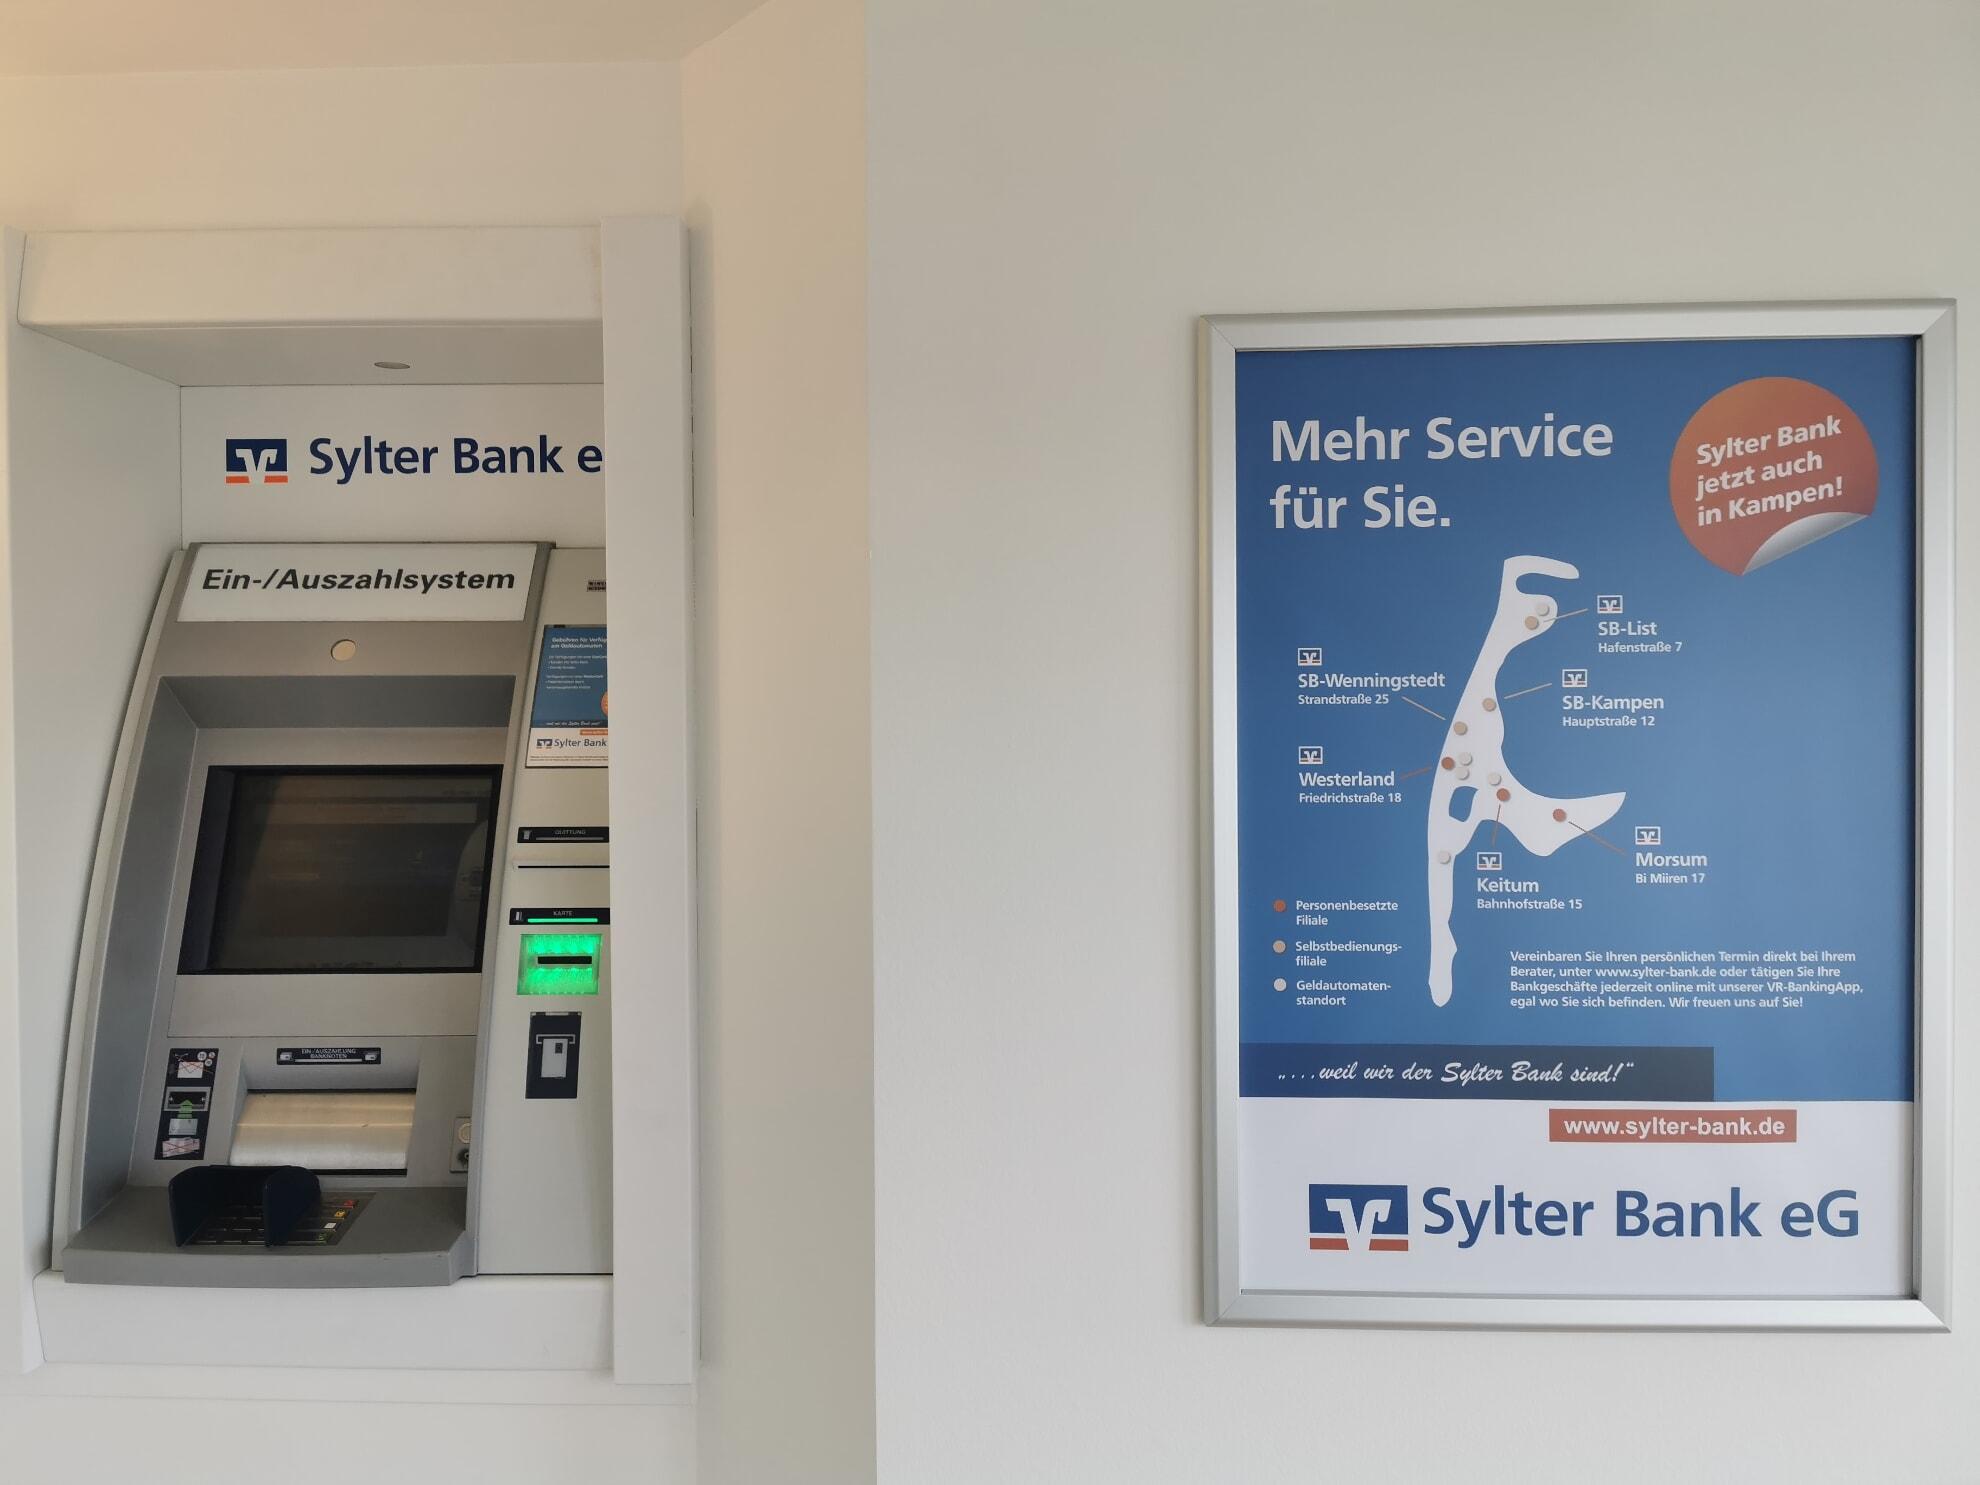 SB-Filiale Sylter Bank eG